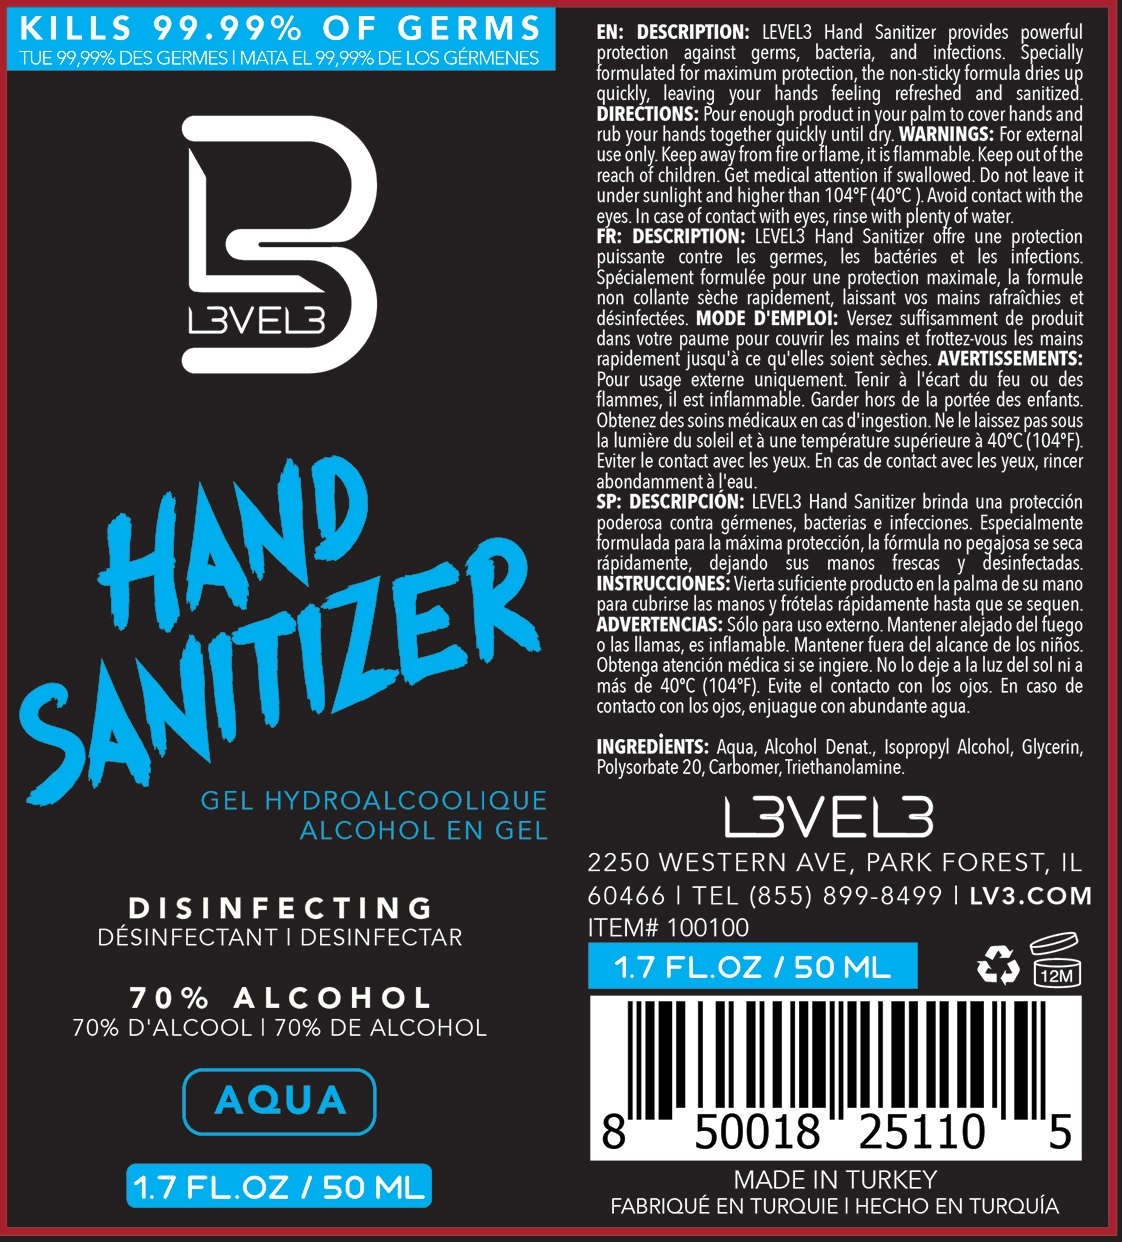 Aqua 50ml Label